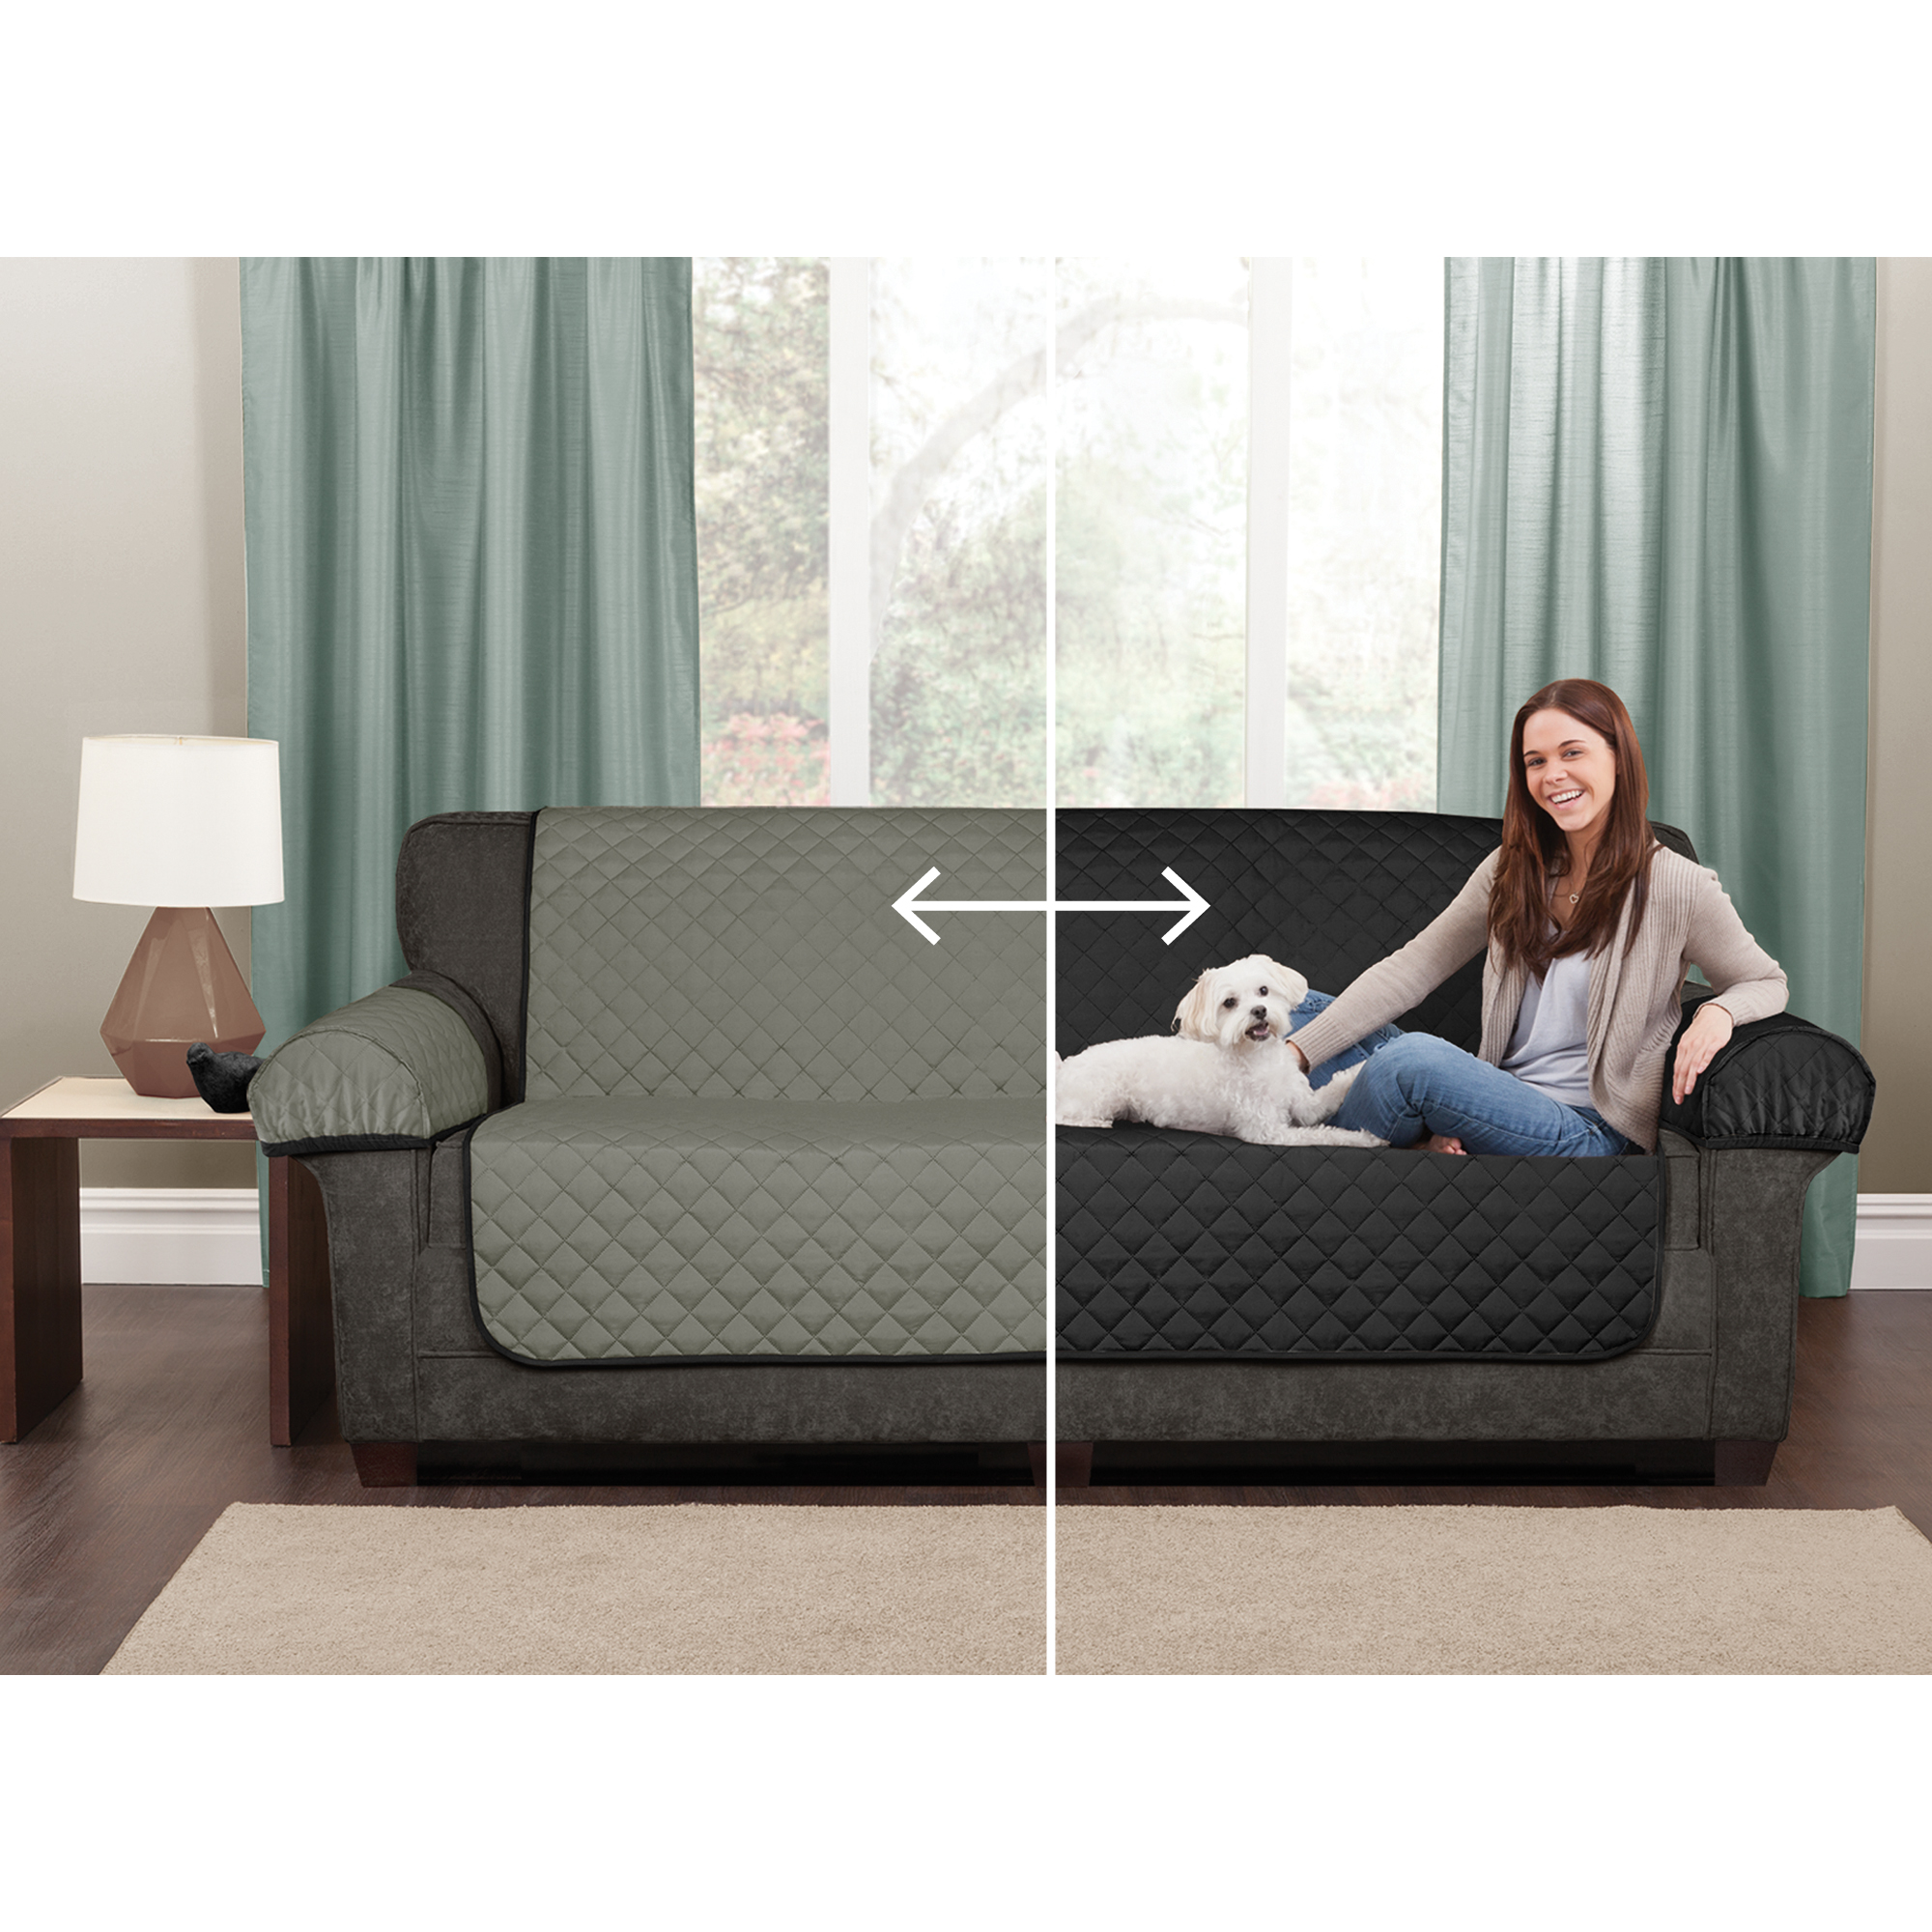 Maytex Reversible 3 Piece Microfiber Sofa Furniture Cover